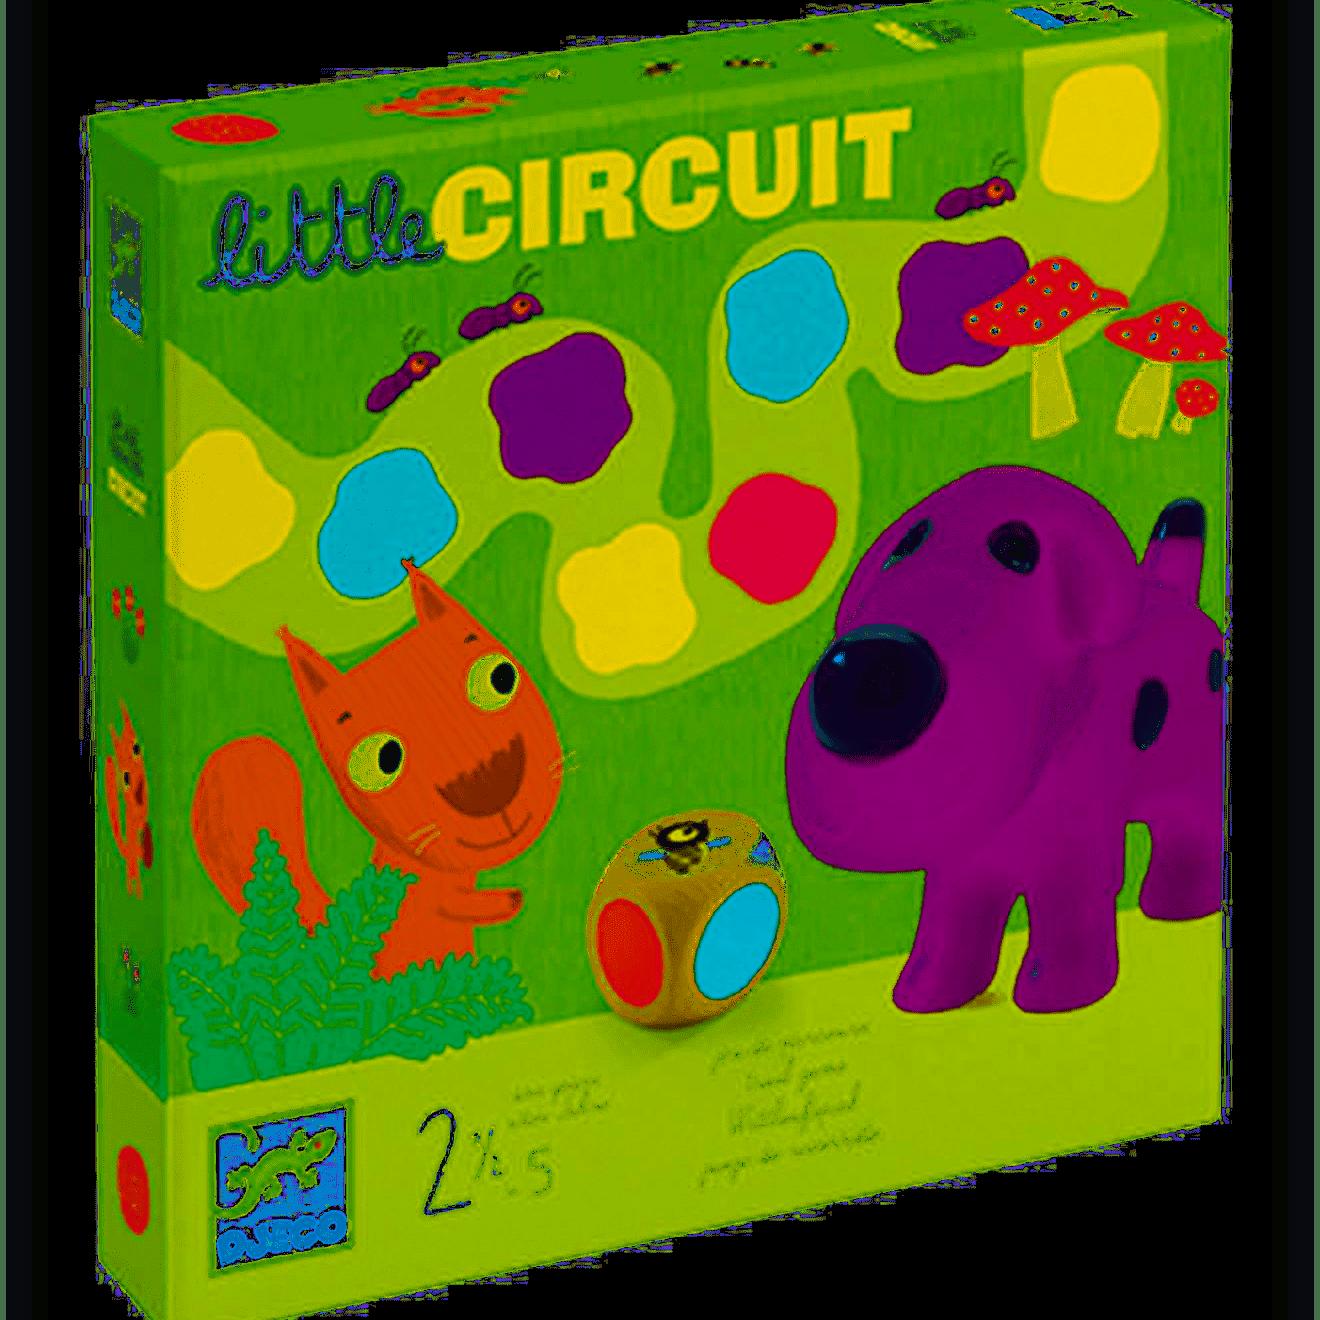 Little circuit - Ref 02N02P